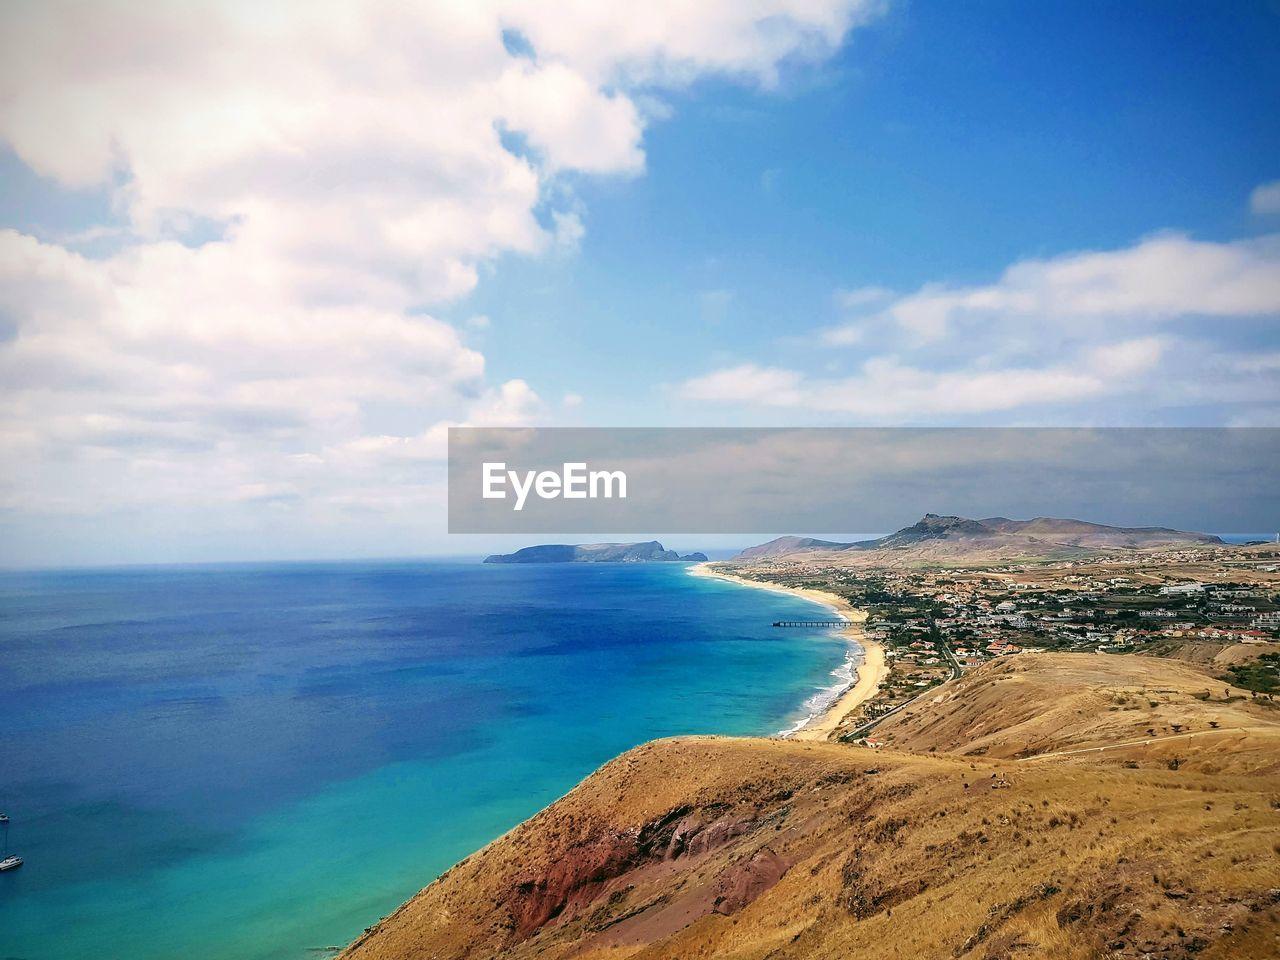 sky, cloud - sky, scenics - nature, beauty in nature, water, sea, tranquil scene, tranquility, land, beach, horizon, nature, horizon over water, day, mountain, no people, idyllic, non-urban scene, outdoors